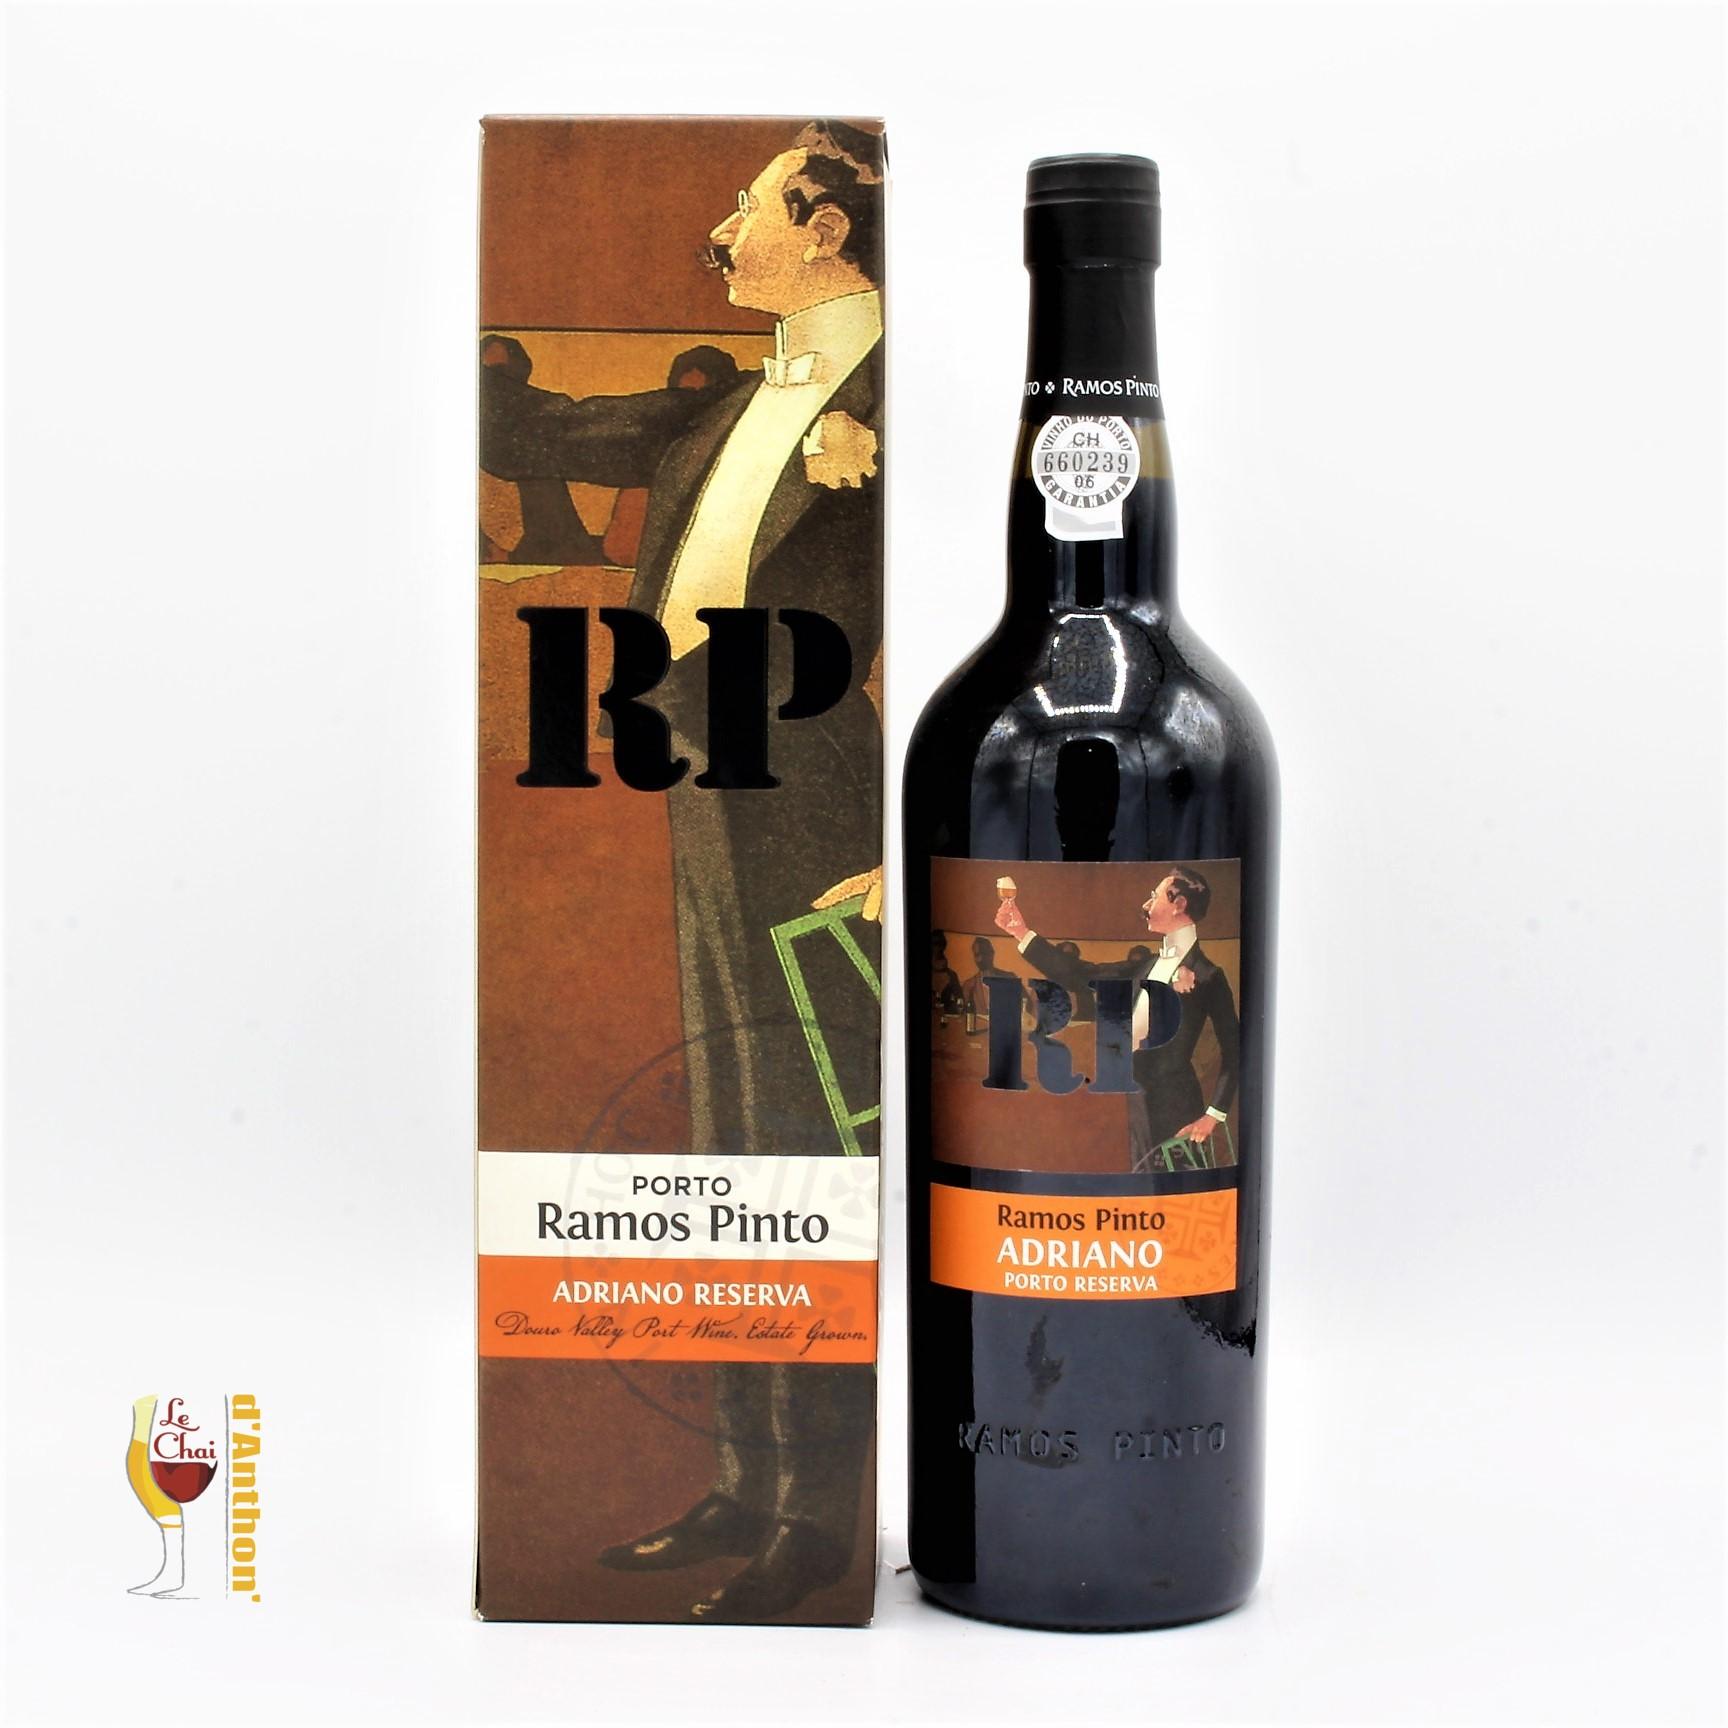 Le Chai D&942.JPG039;Anthon Vin De Liqueur Porto Douro Ramos Pinto Adriano 75cl 942